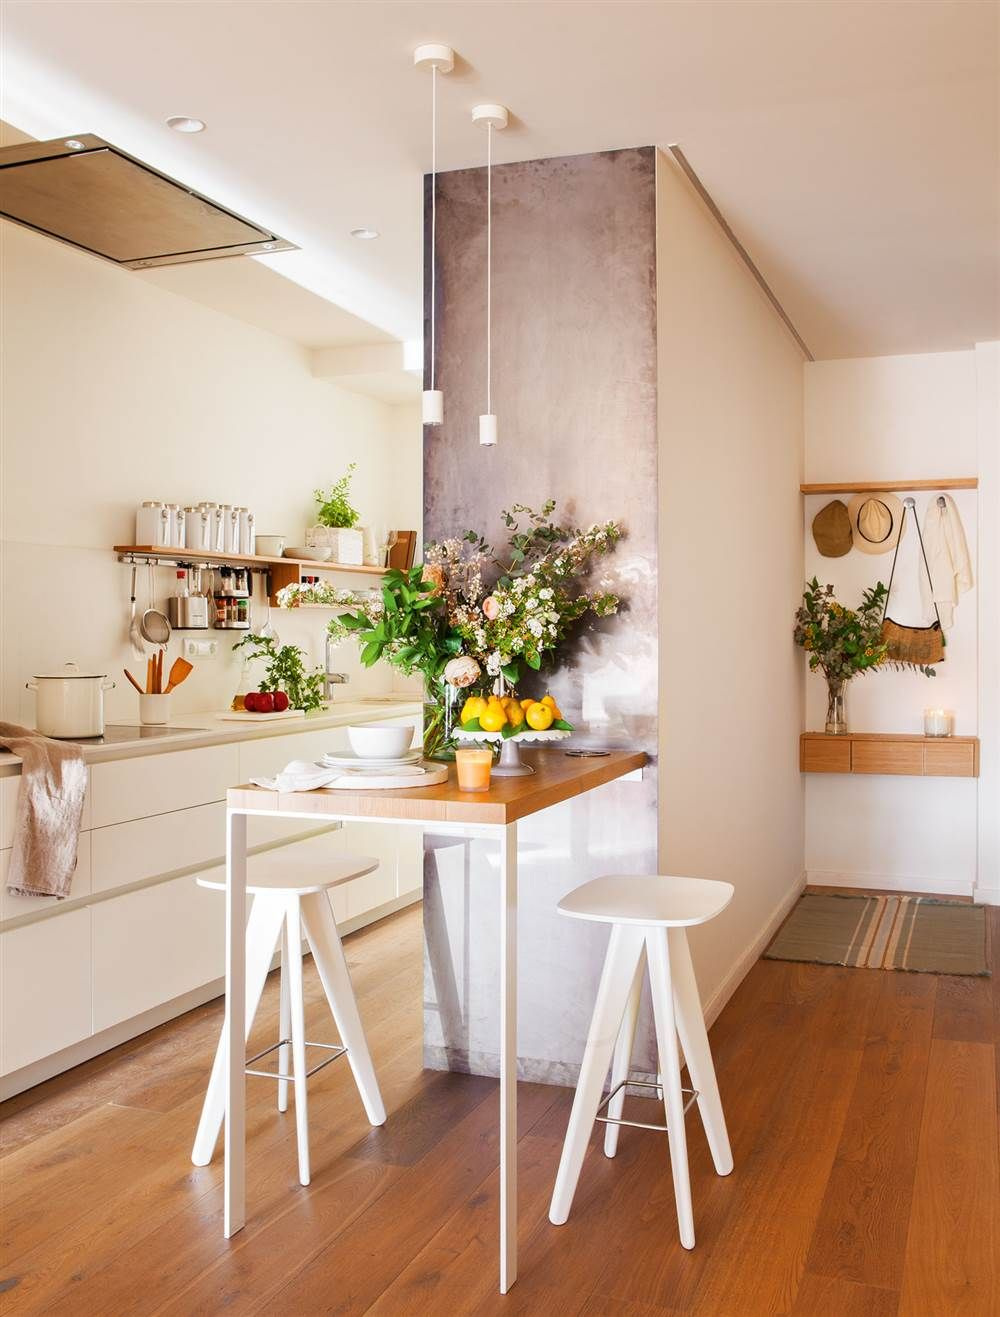 10 pisos pequeños con grandes ideas | Pinterest | Piso pequeño ...